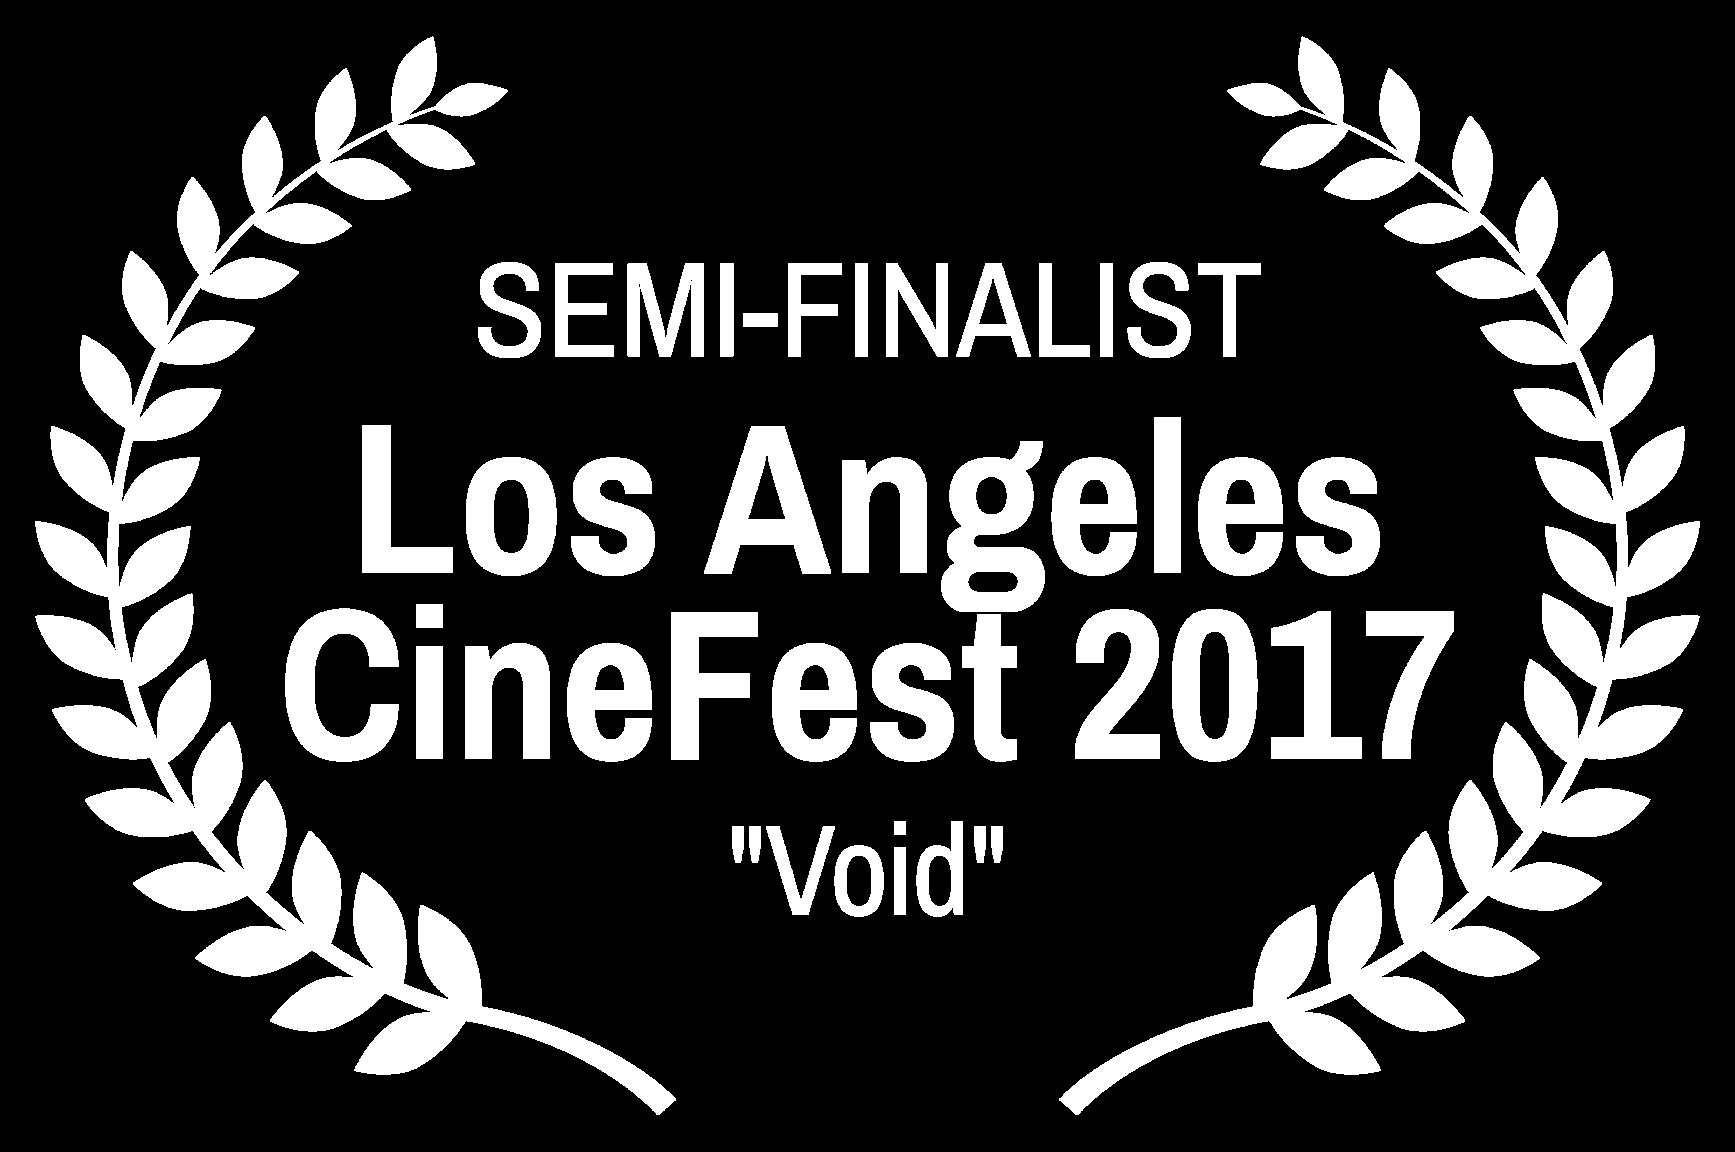 SEMI-FINALIST - Los Angeles CineFest 2017 - Void.png